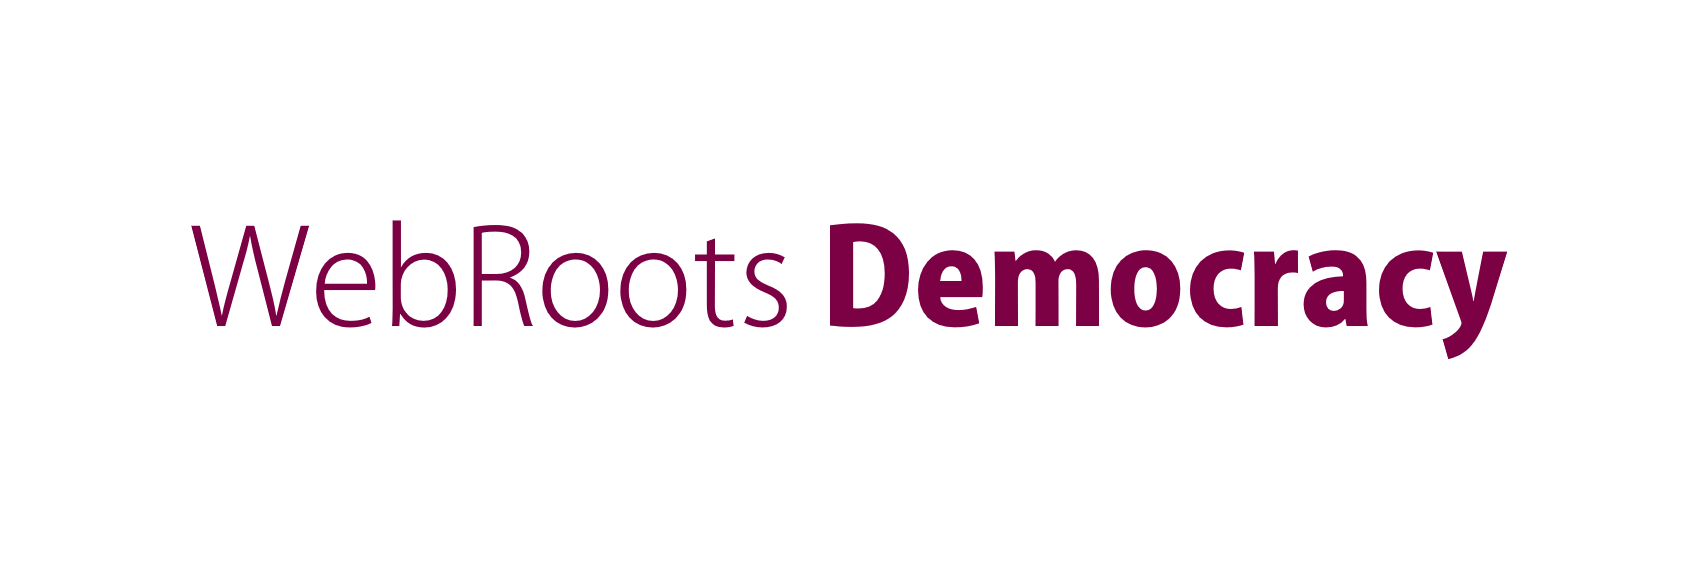 WebRoots Democracy